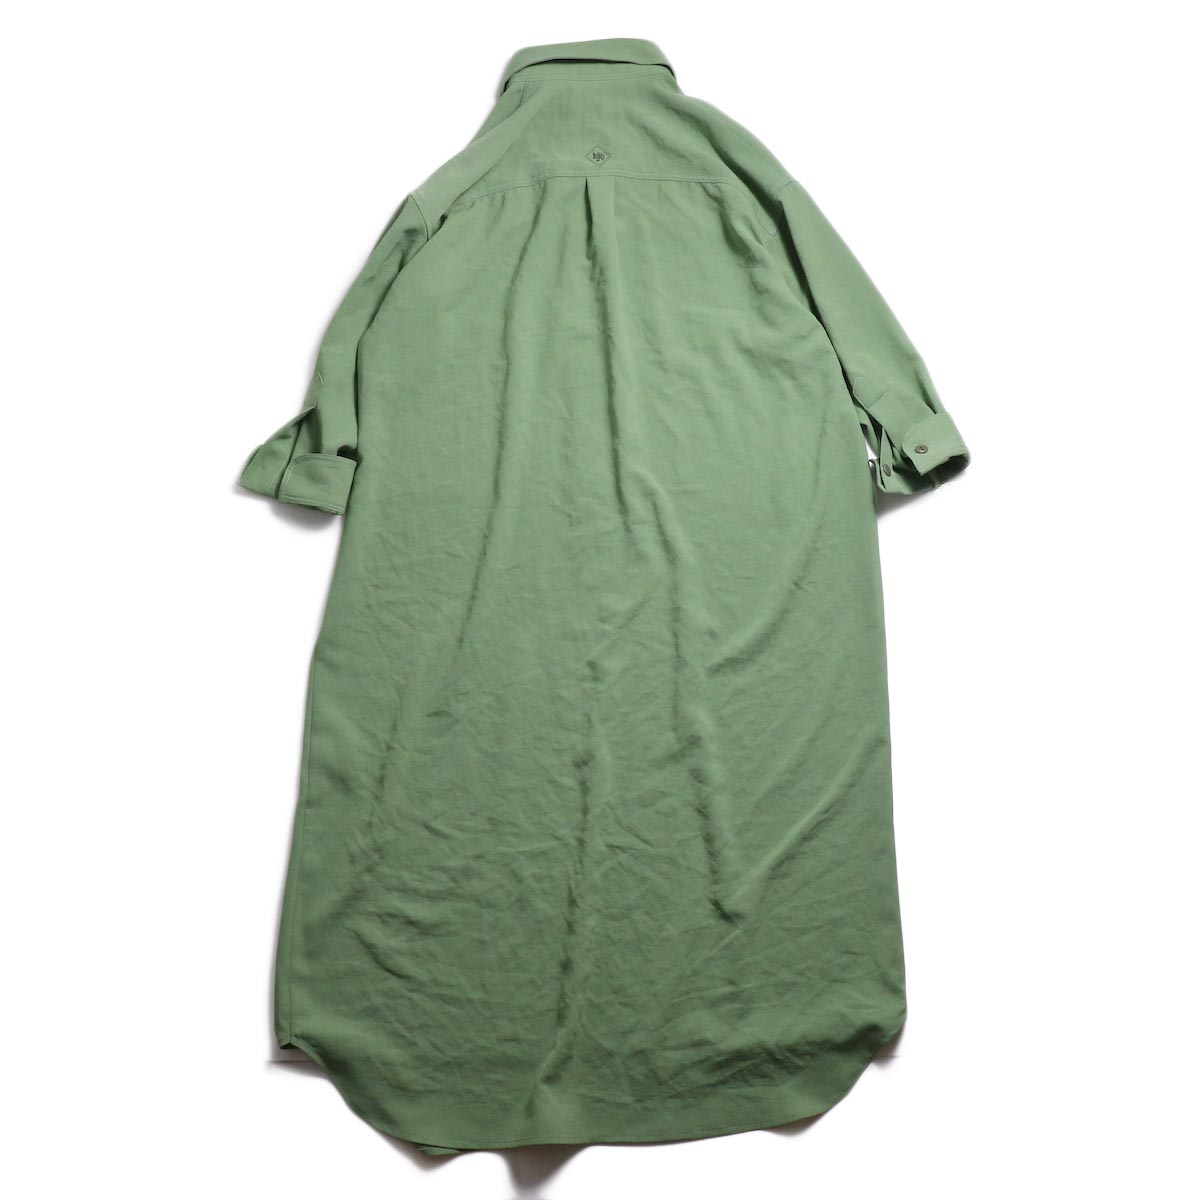 BLUEBIRD BOULEVARD / ワッシャーツイルシャツドレス -Green 背面